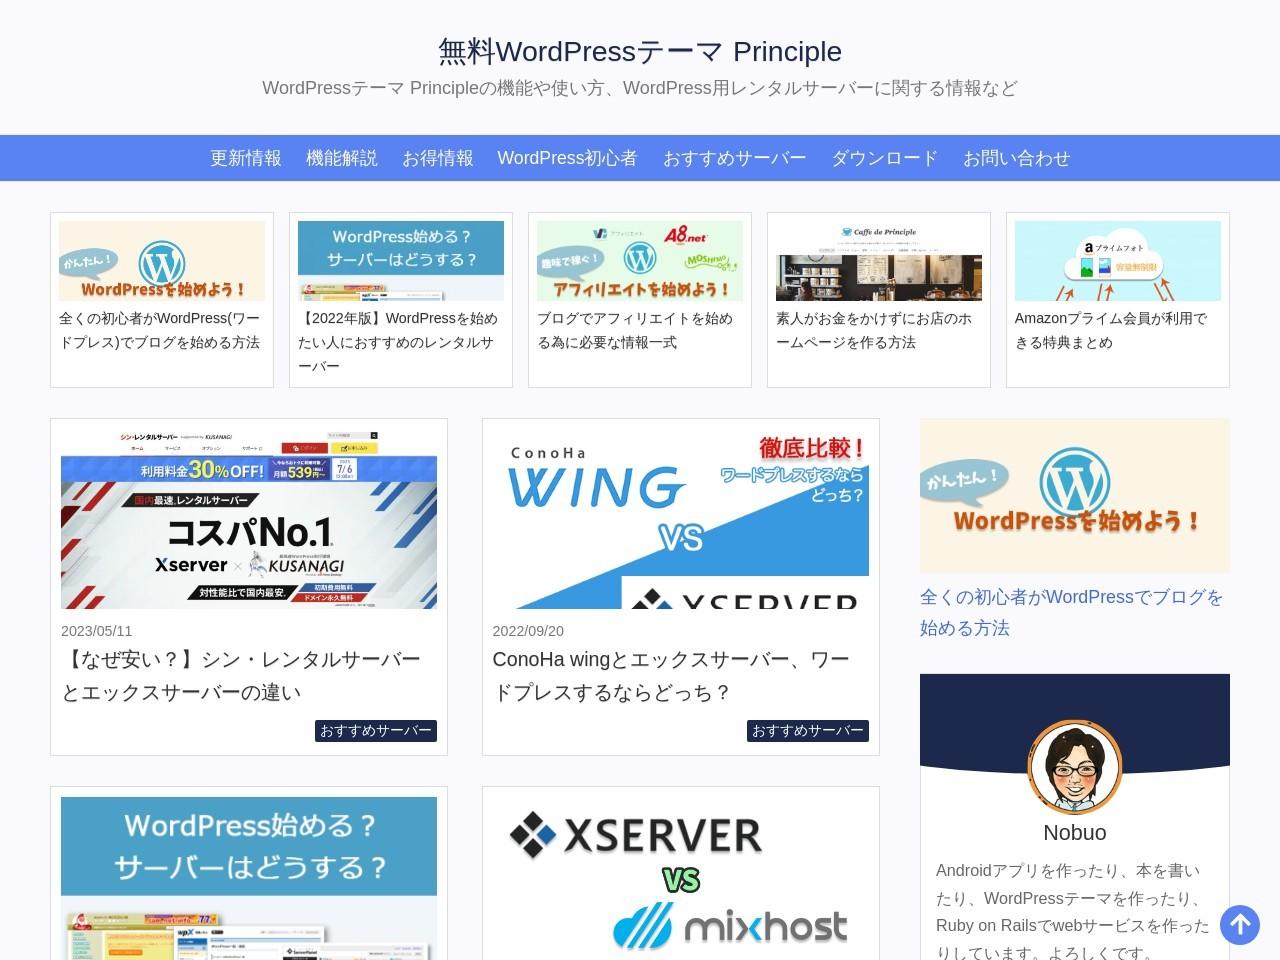 http://wp-principle.net/make-theme/